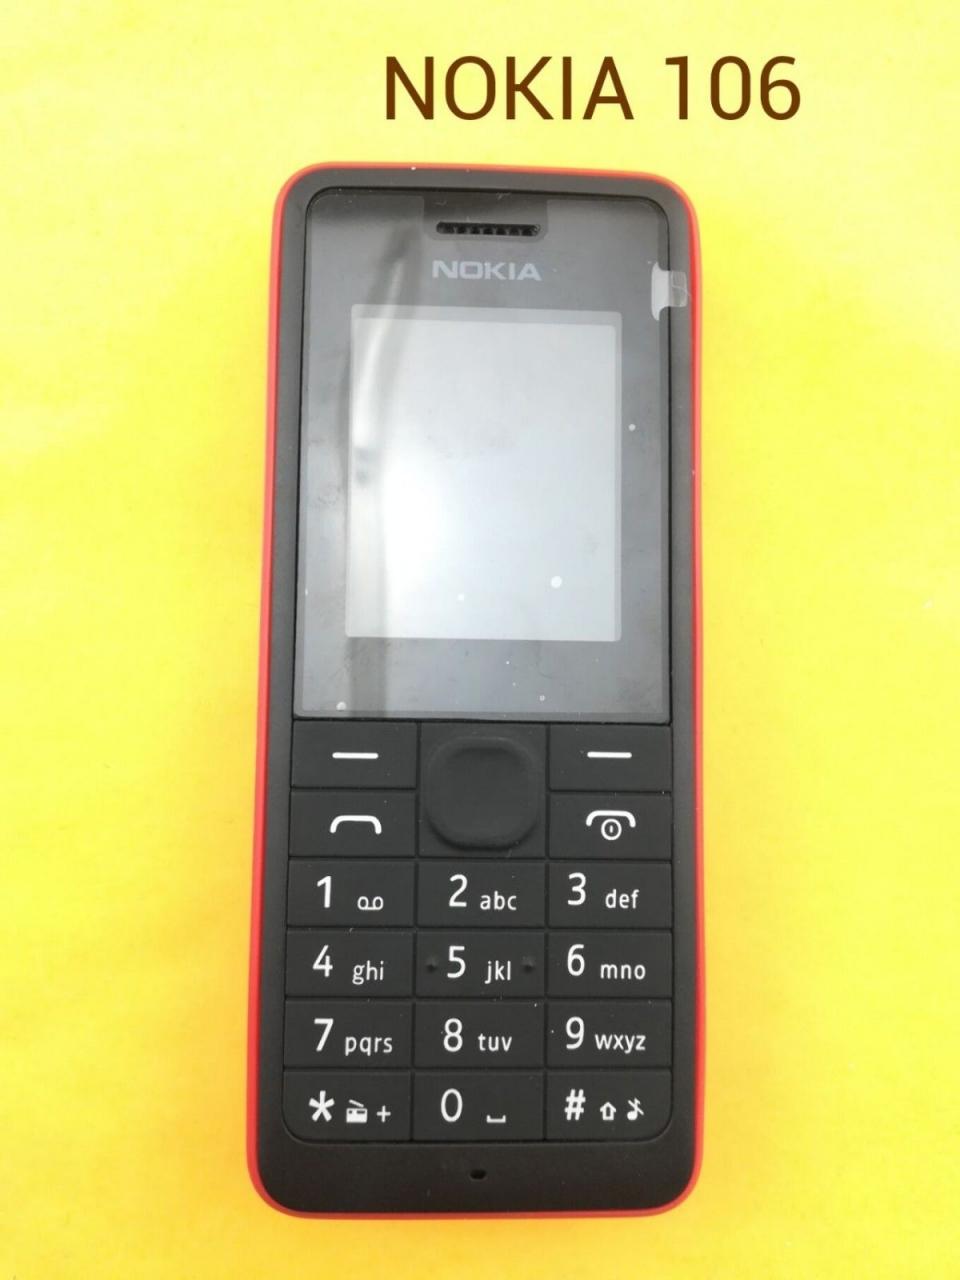 new Nokia 106 Unlocked Simple Mobile Phone Multiple keyboards languages white 6